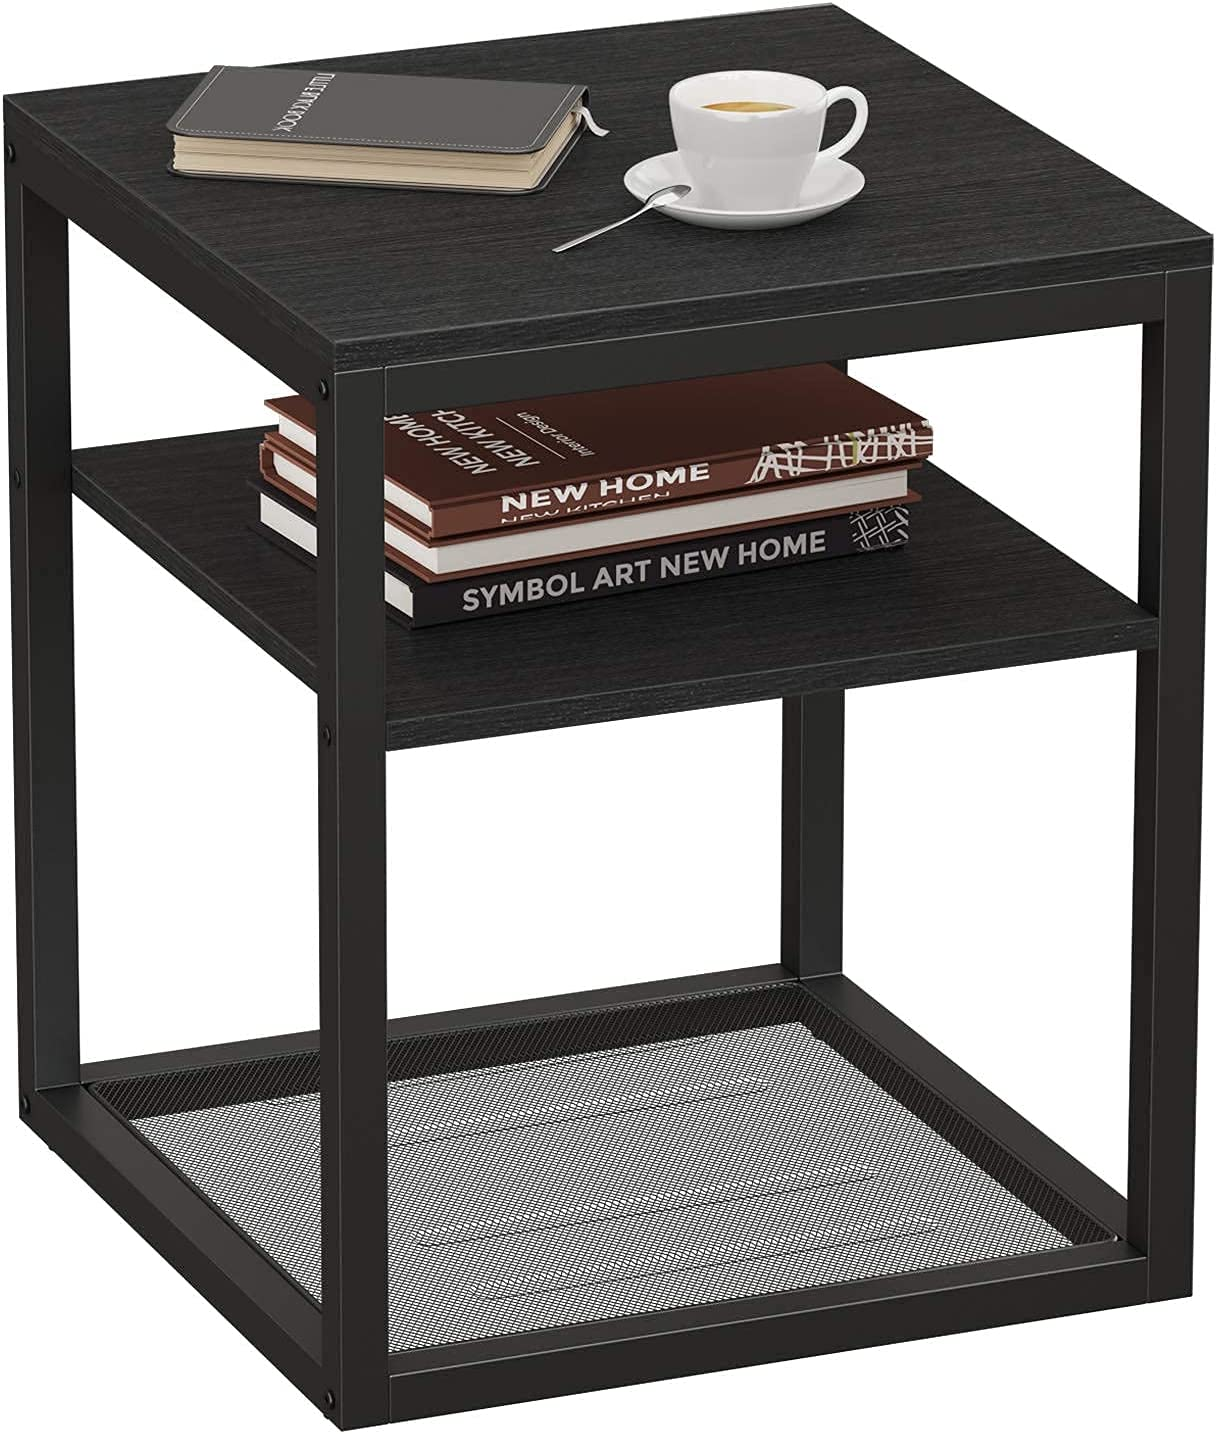 Black End Table - Bedroom Nightstands